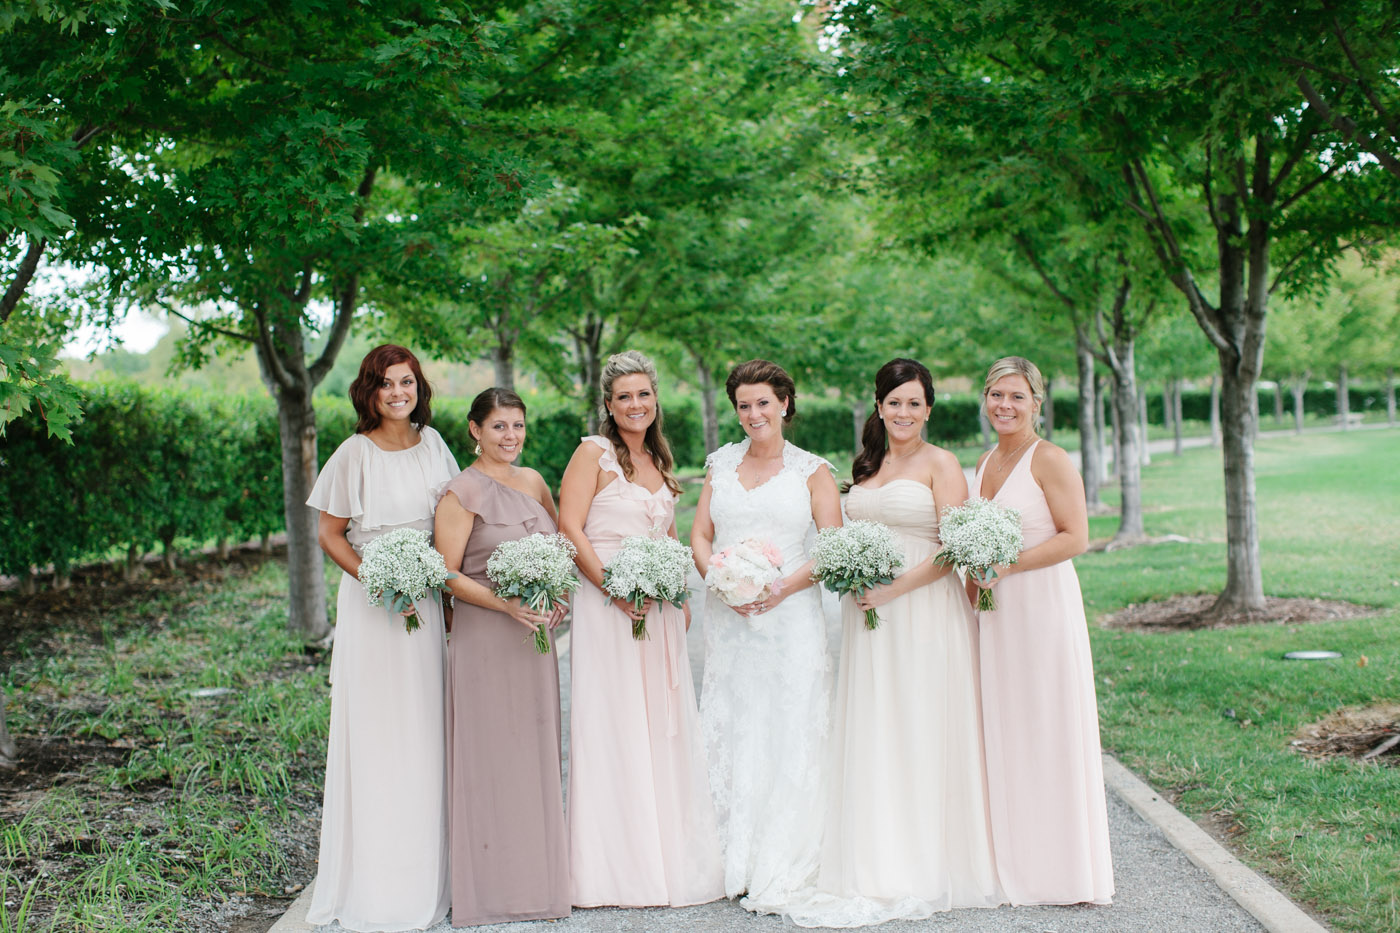 St-Louis-Wedding-Photography-1043.jpg